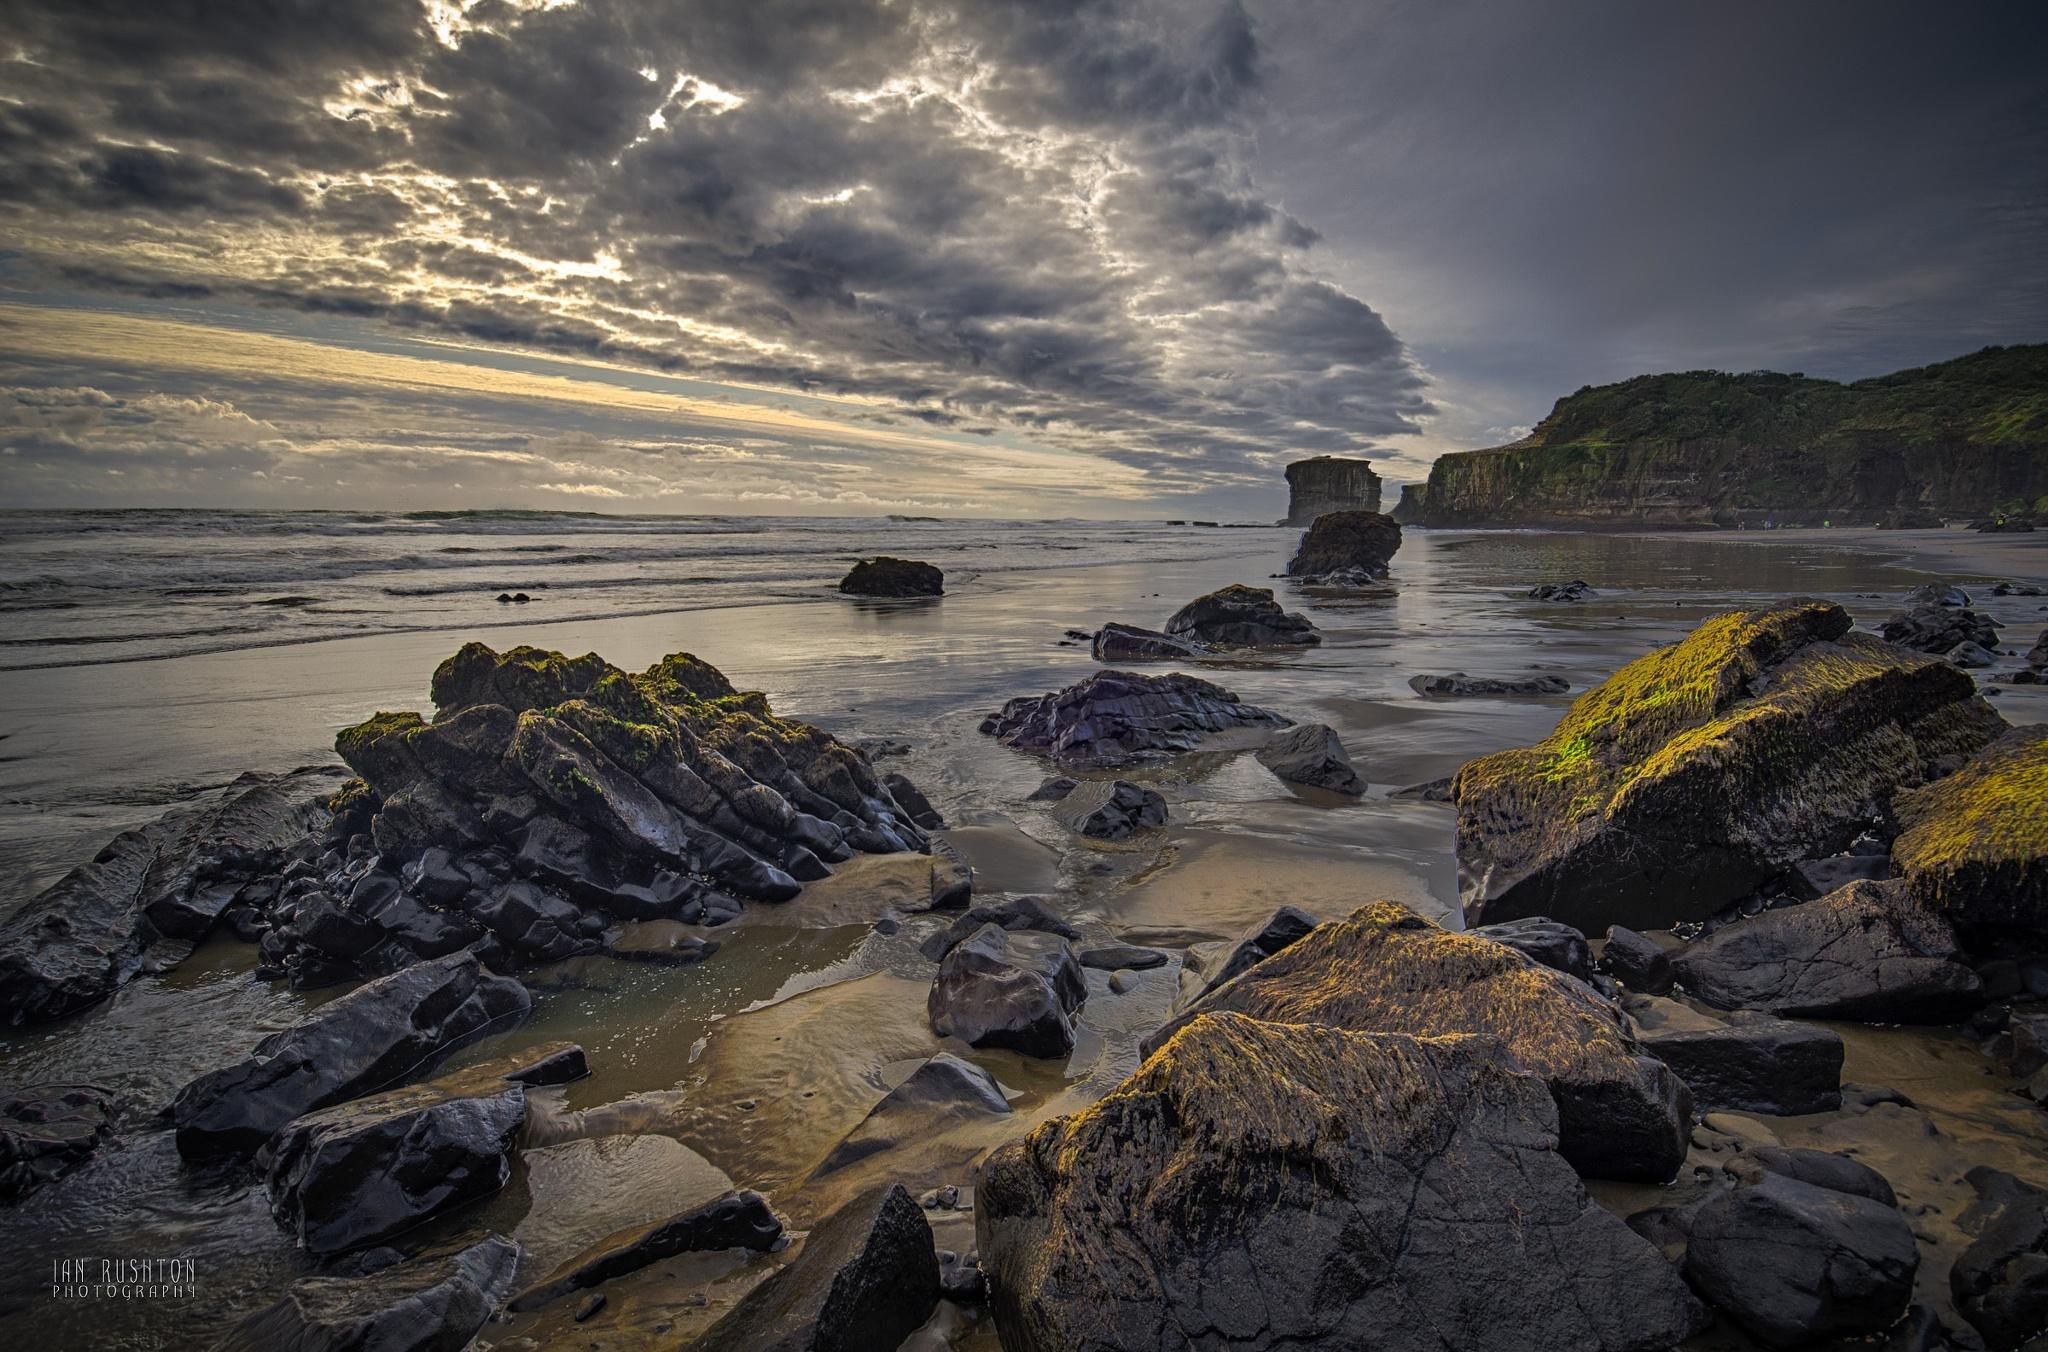 Maori Bay by Ian Rushton